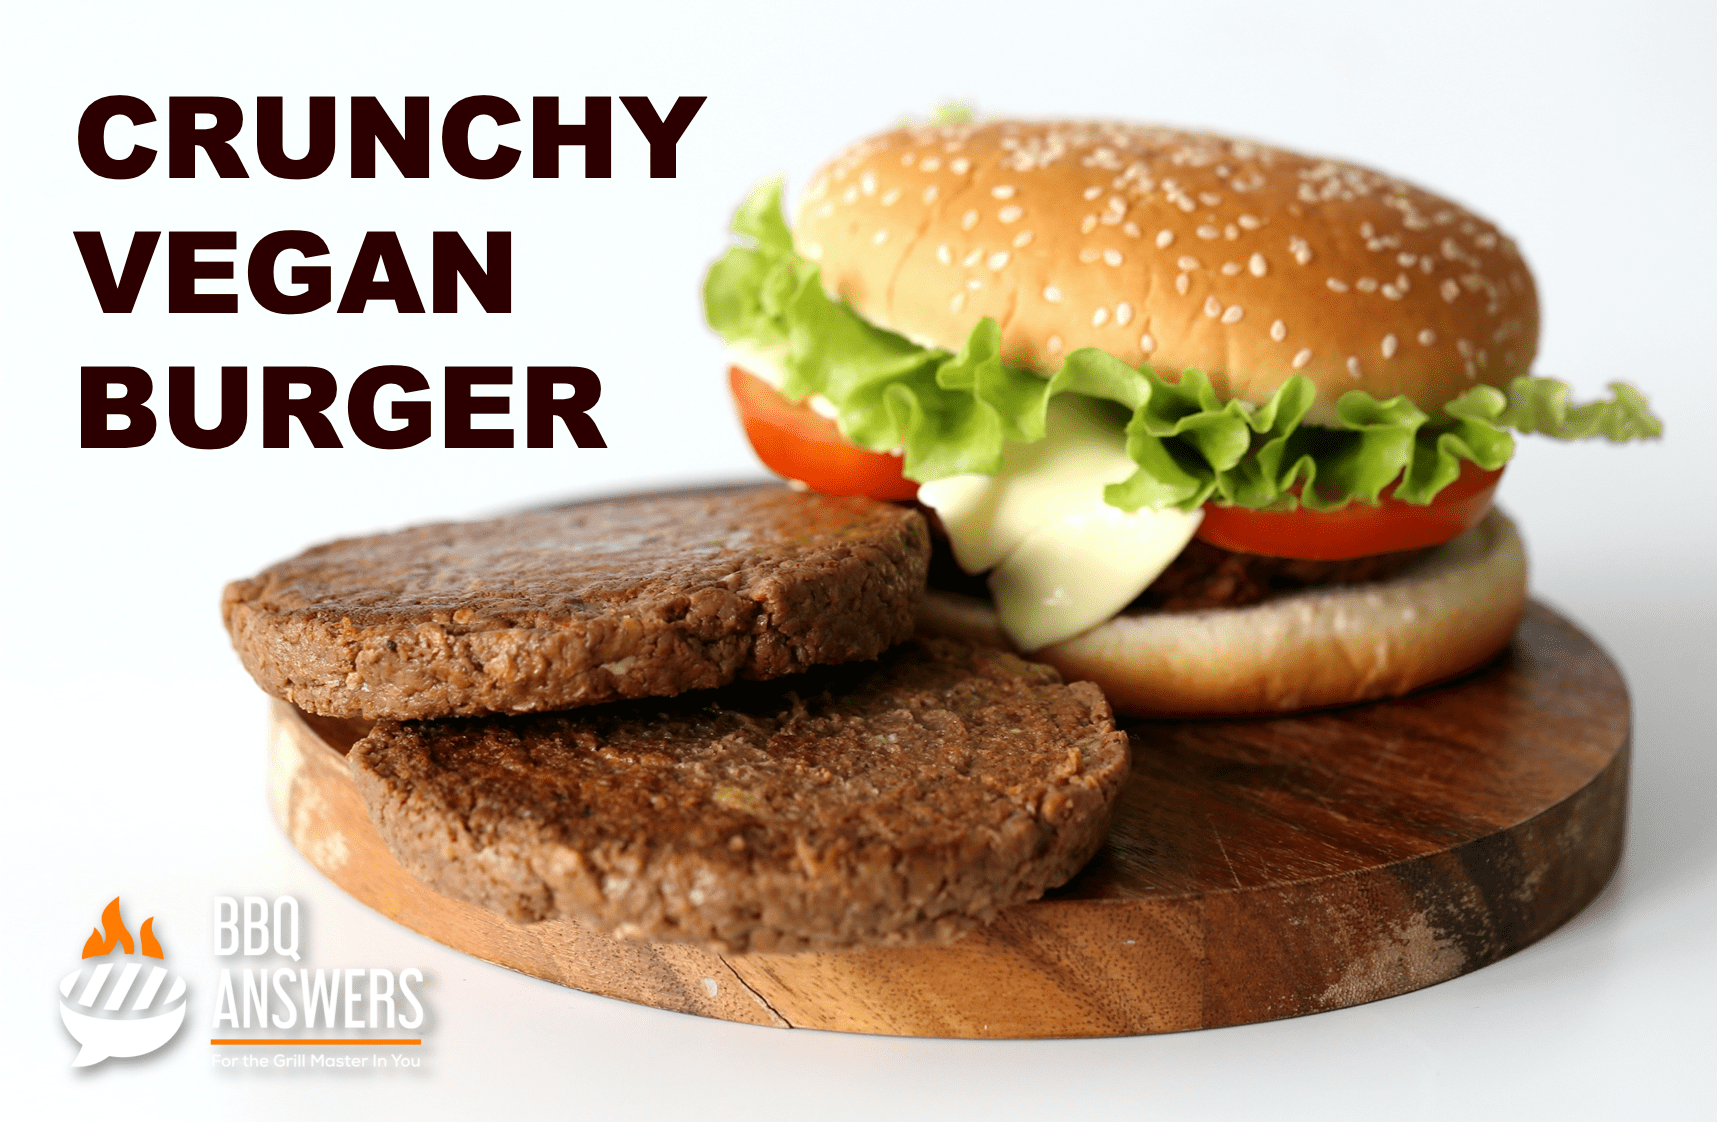 Crunchy Vegan Burger   Vegan Burgers You Must Try   BBQanswers